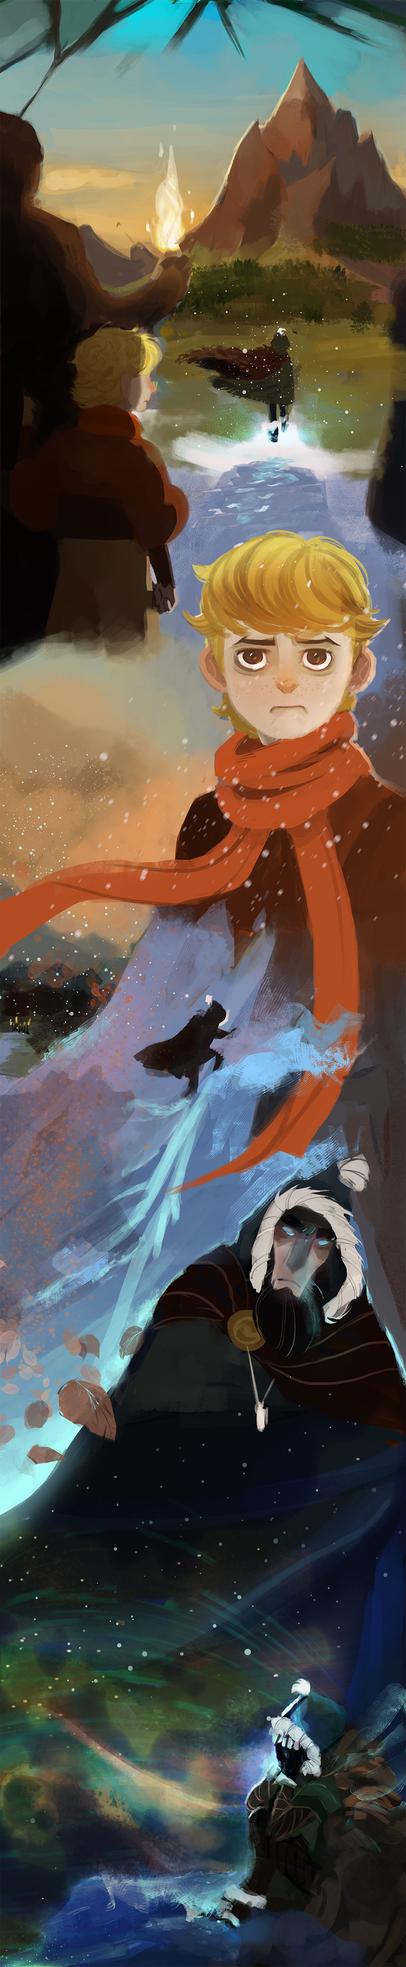 Frostblight:Saga (11) by michaeldoig